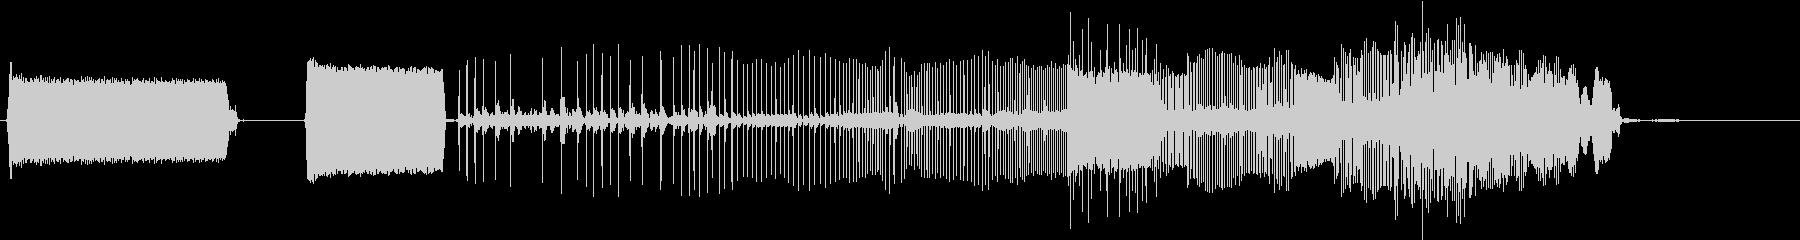 SciFi EC01_86_2の未再生の波形